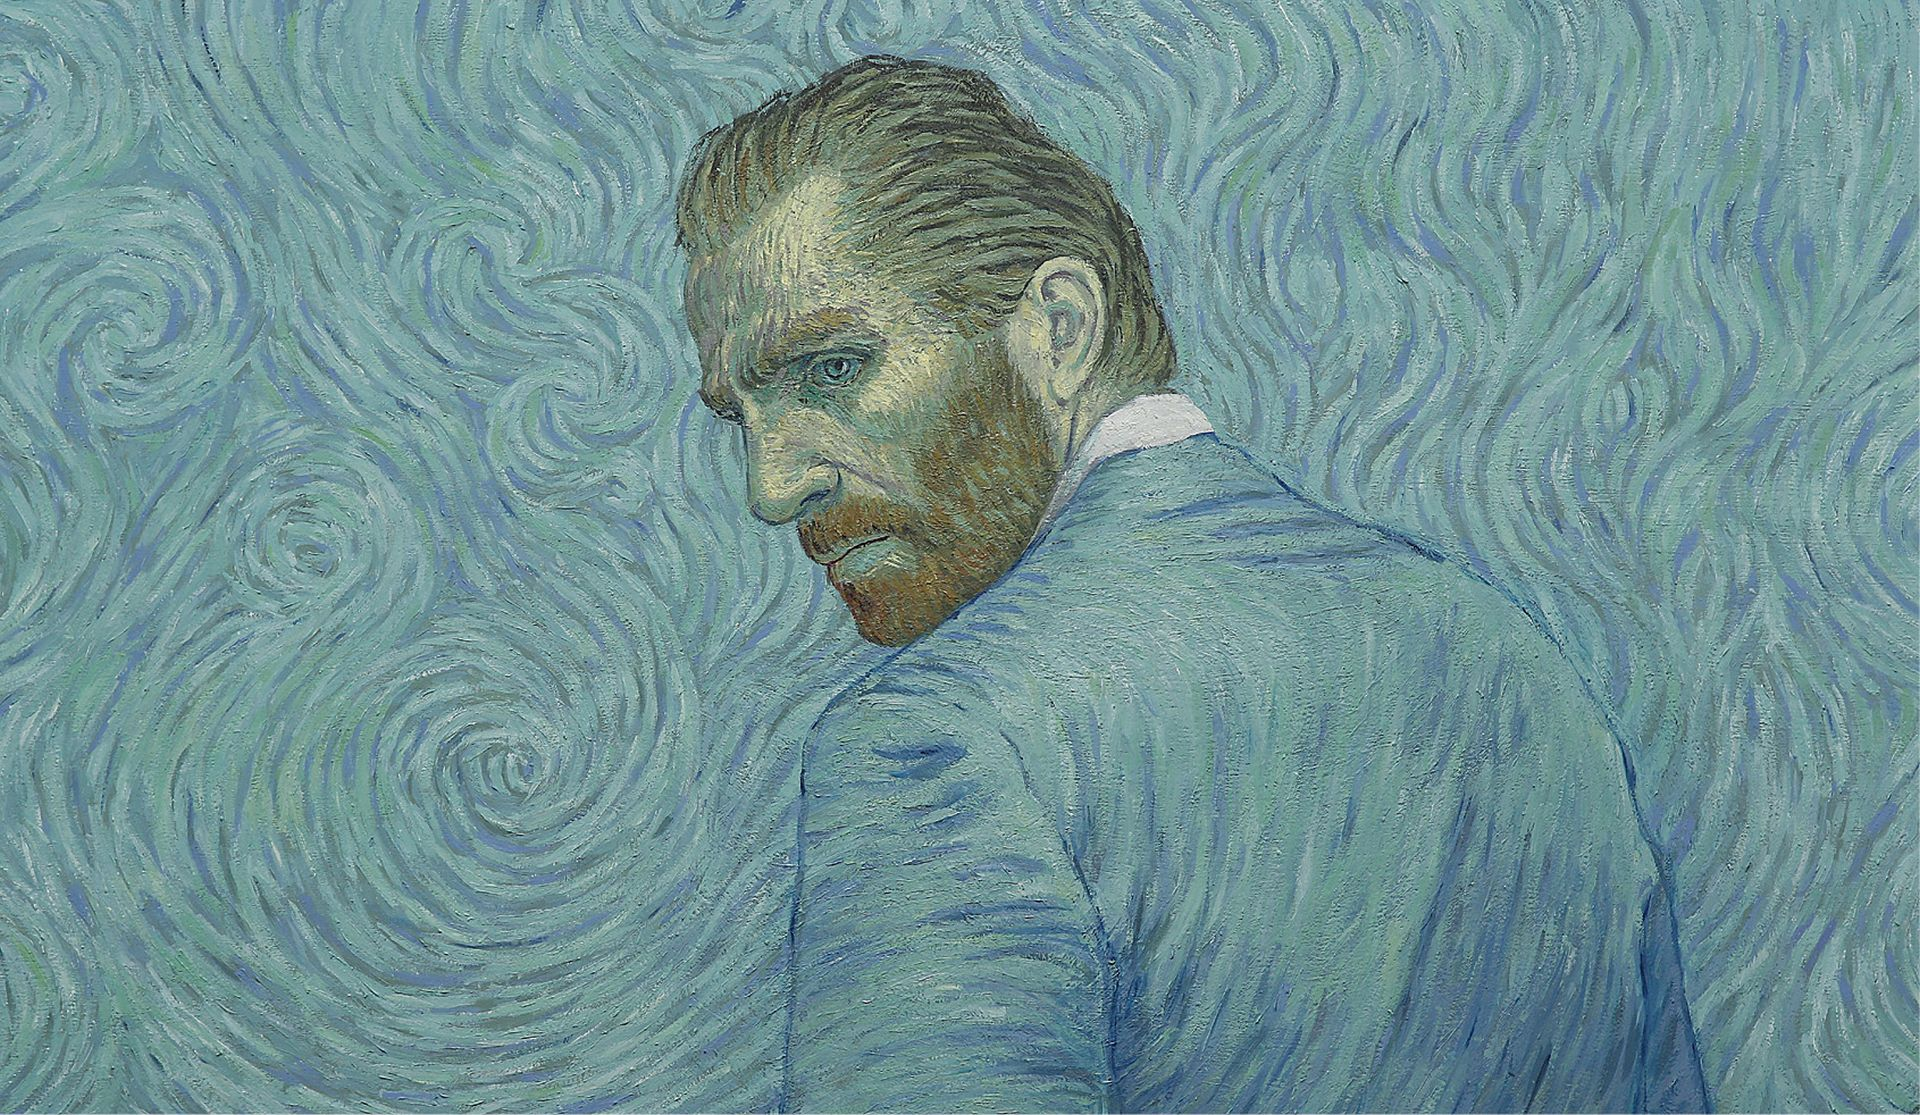 'Za minutu filma o Van Goghu naslikala sam oko 600 slika'